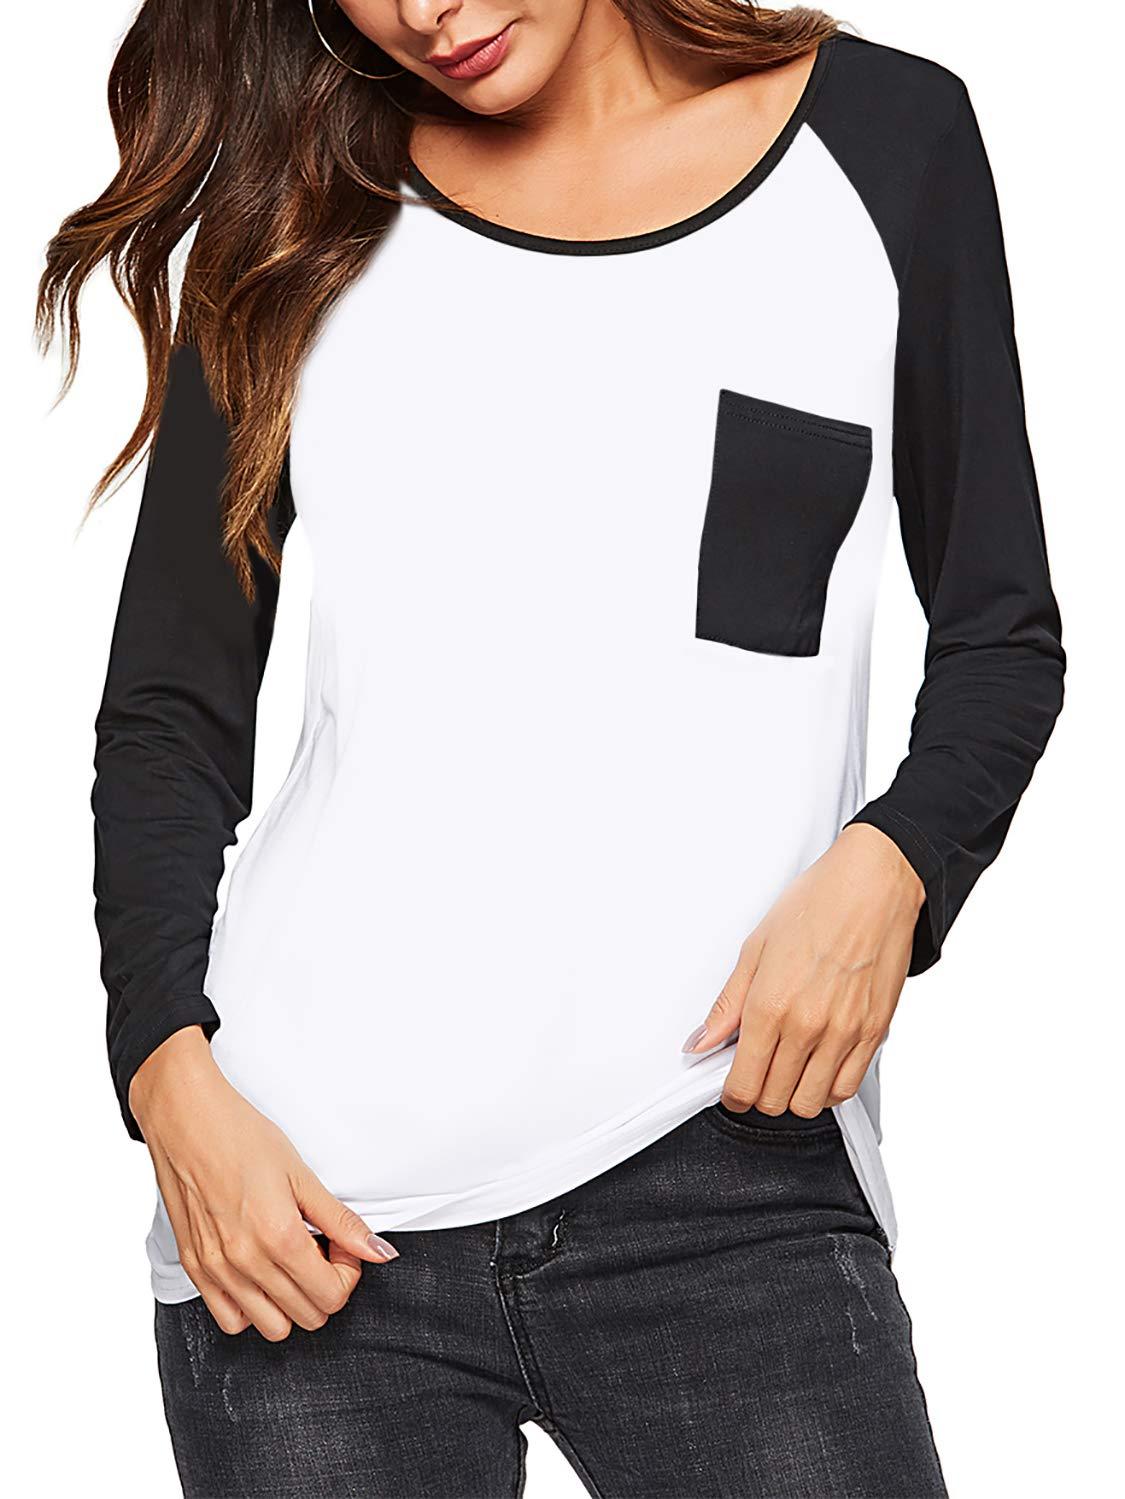 Amortu Women's Crew Neck Shirts Sretch Long Sleeve Raglan Baseball T-Shirt Black L by Amoretu (Image #1)